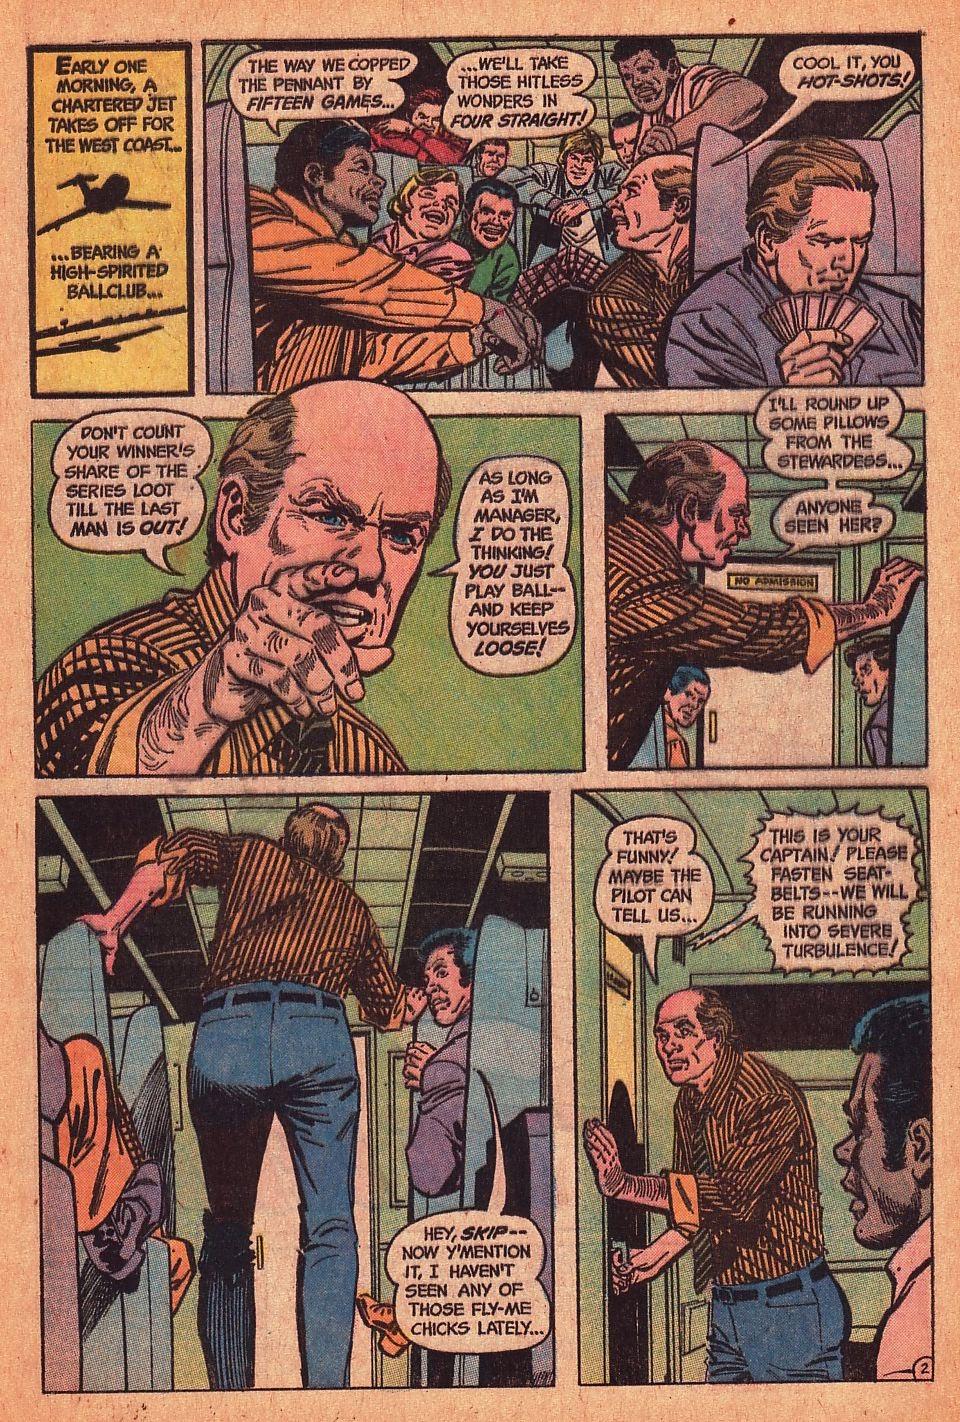 Strange Sports Stories (1973) 1 Page 3